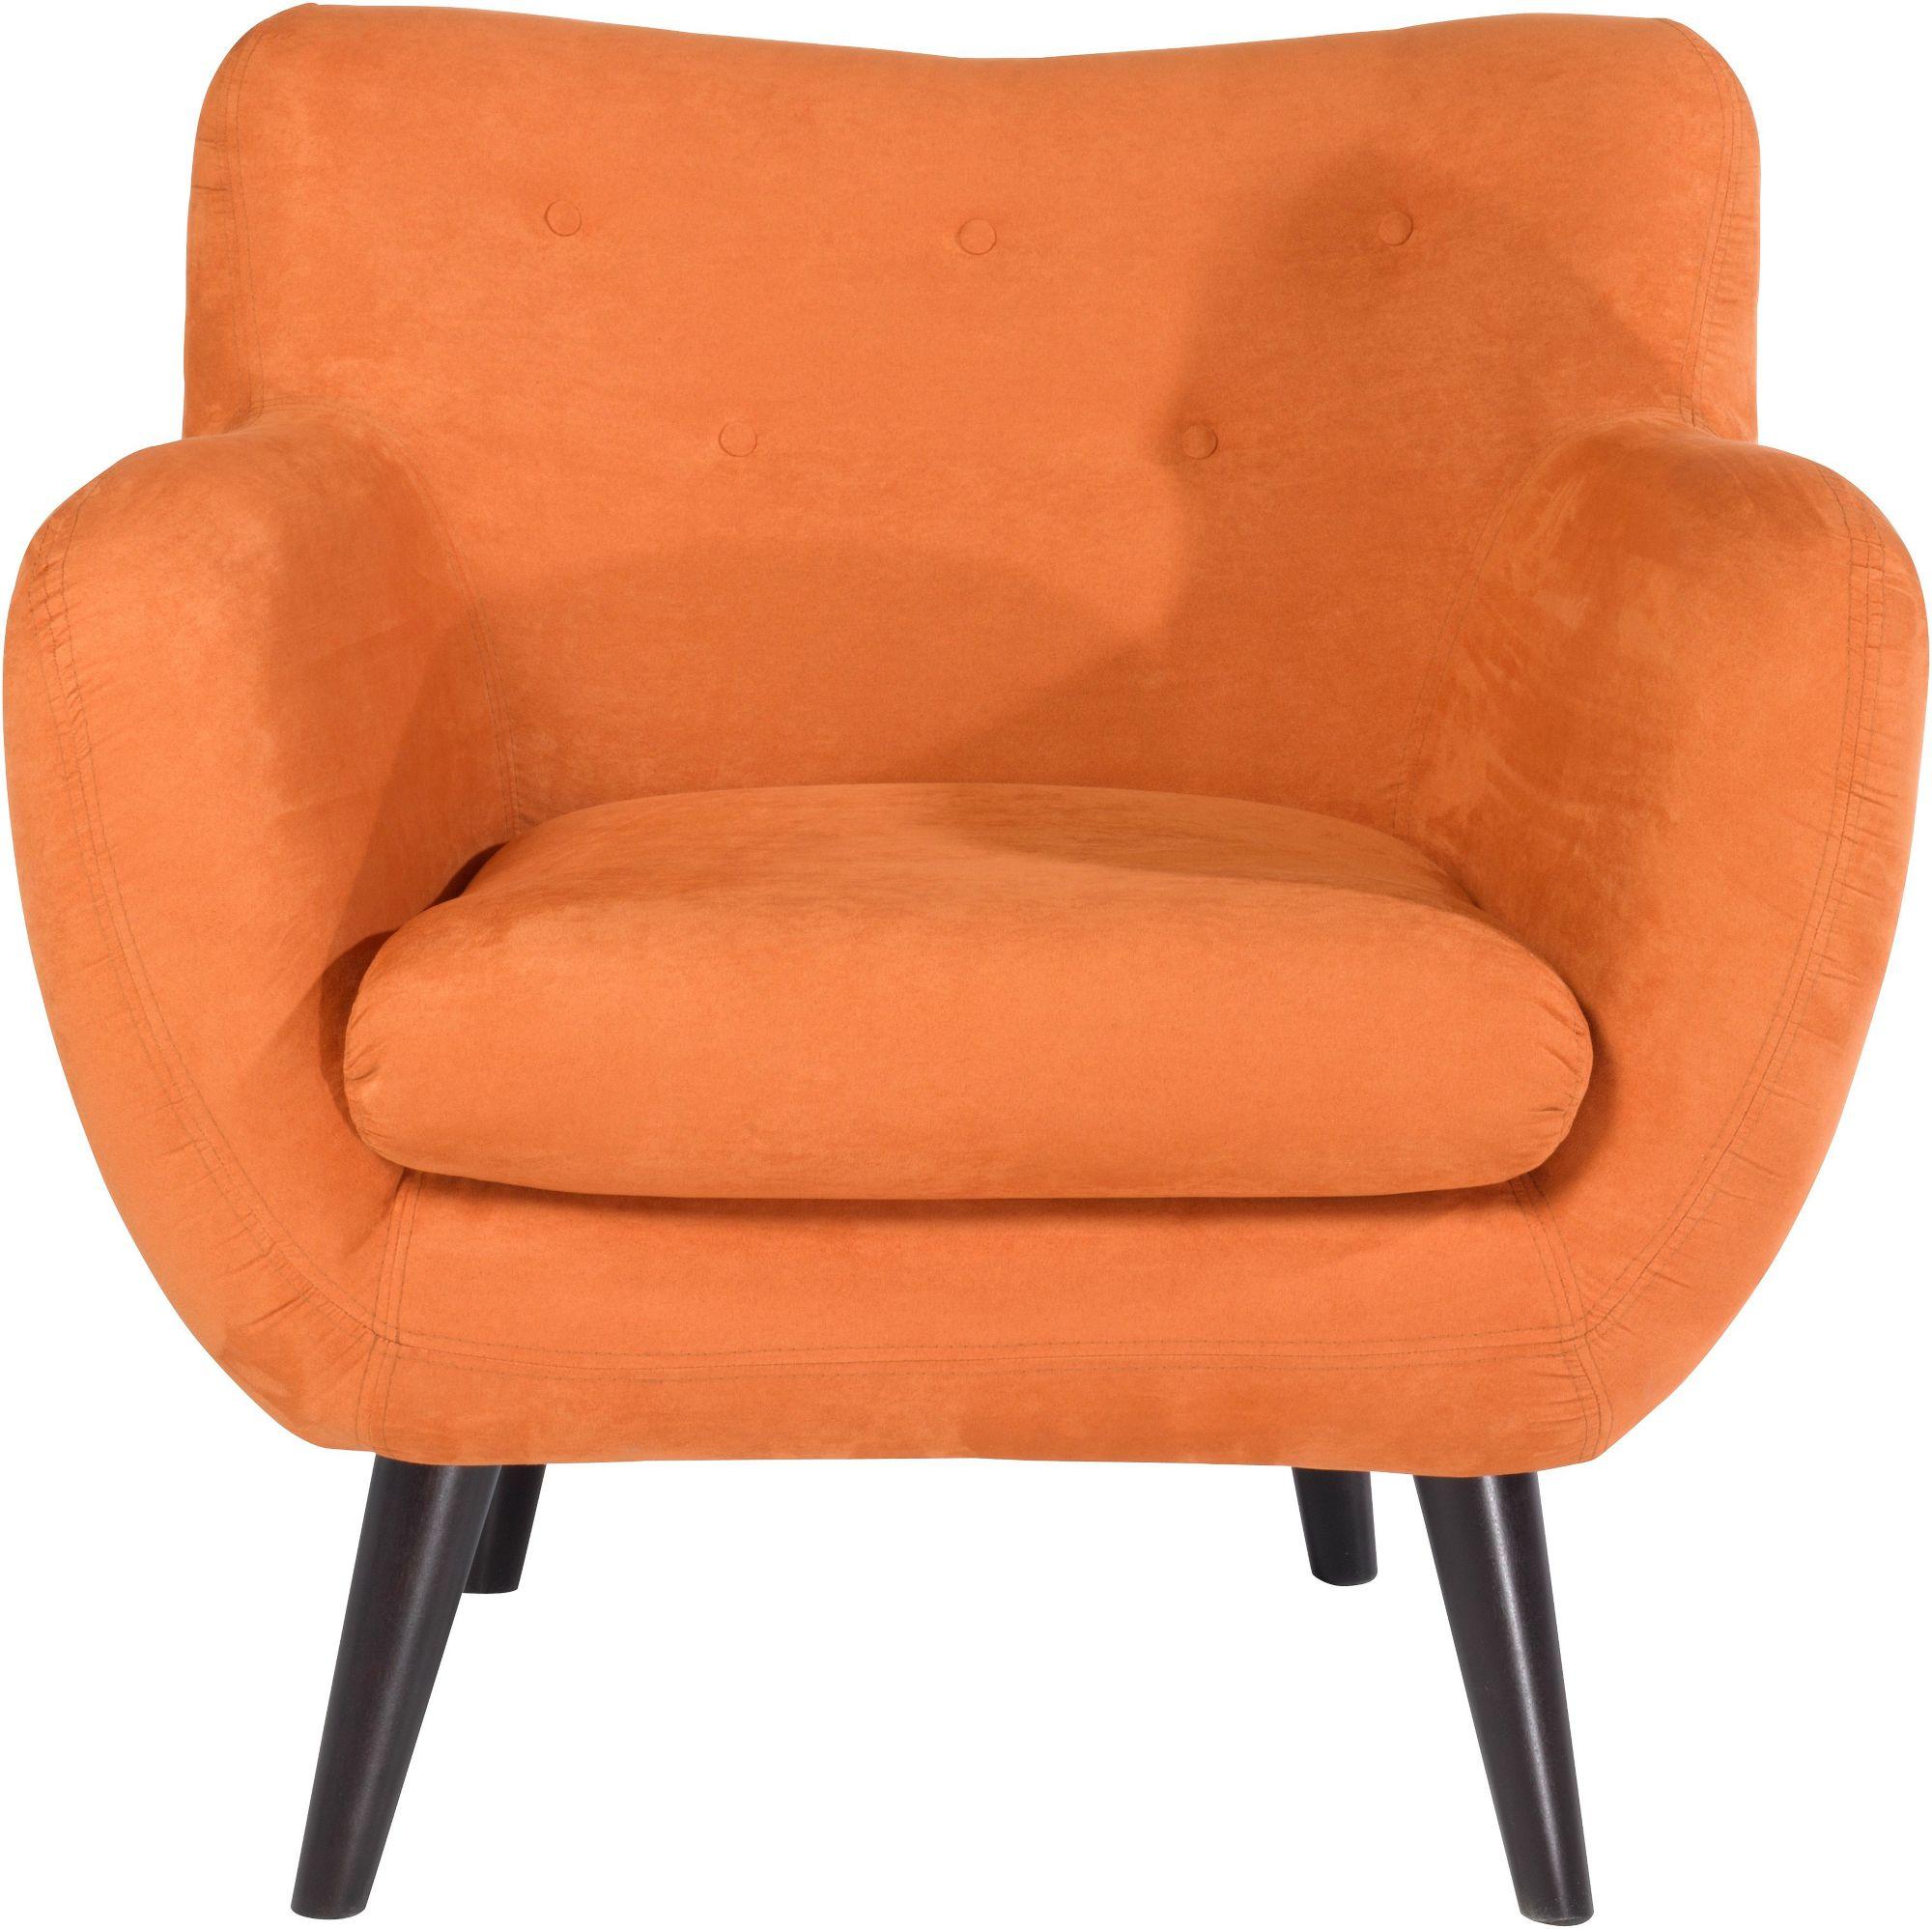 inosign sessel im retro style schwab versand. Black Bedroom Furniture Sets. Home Design Ideas